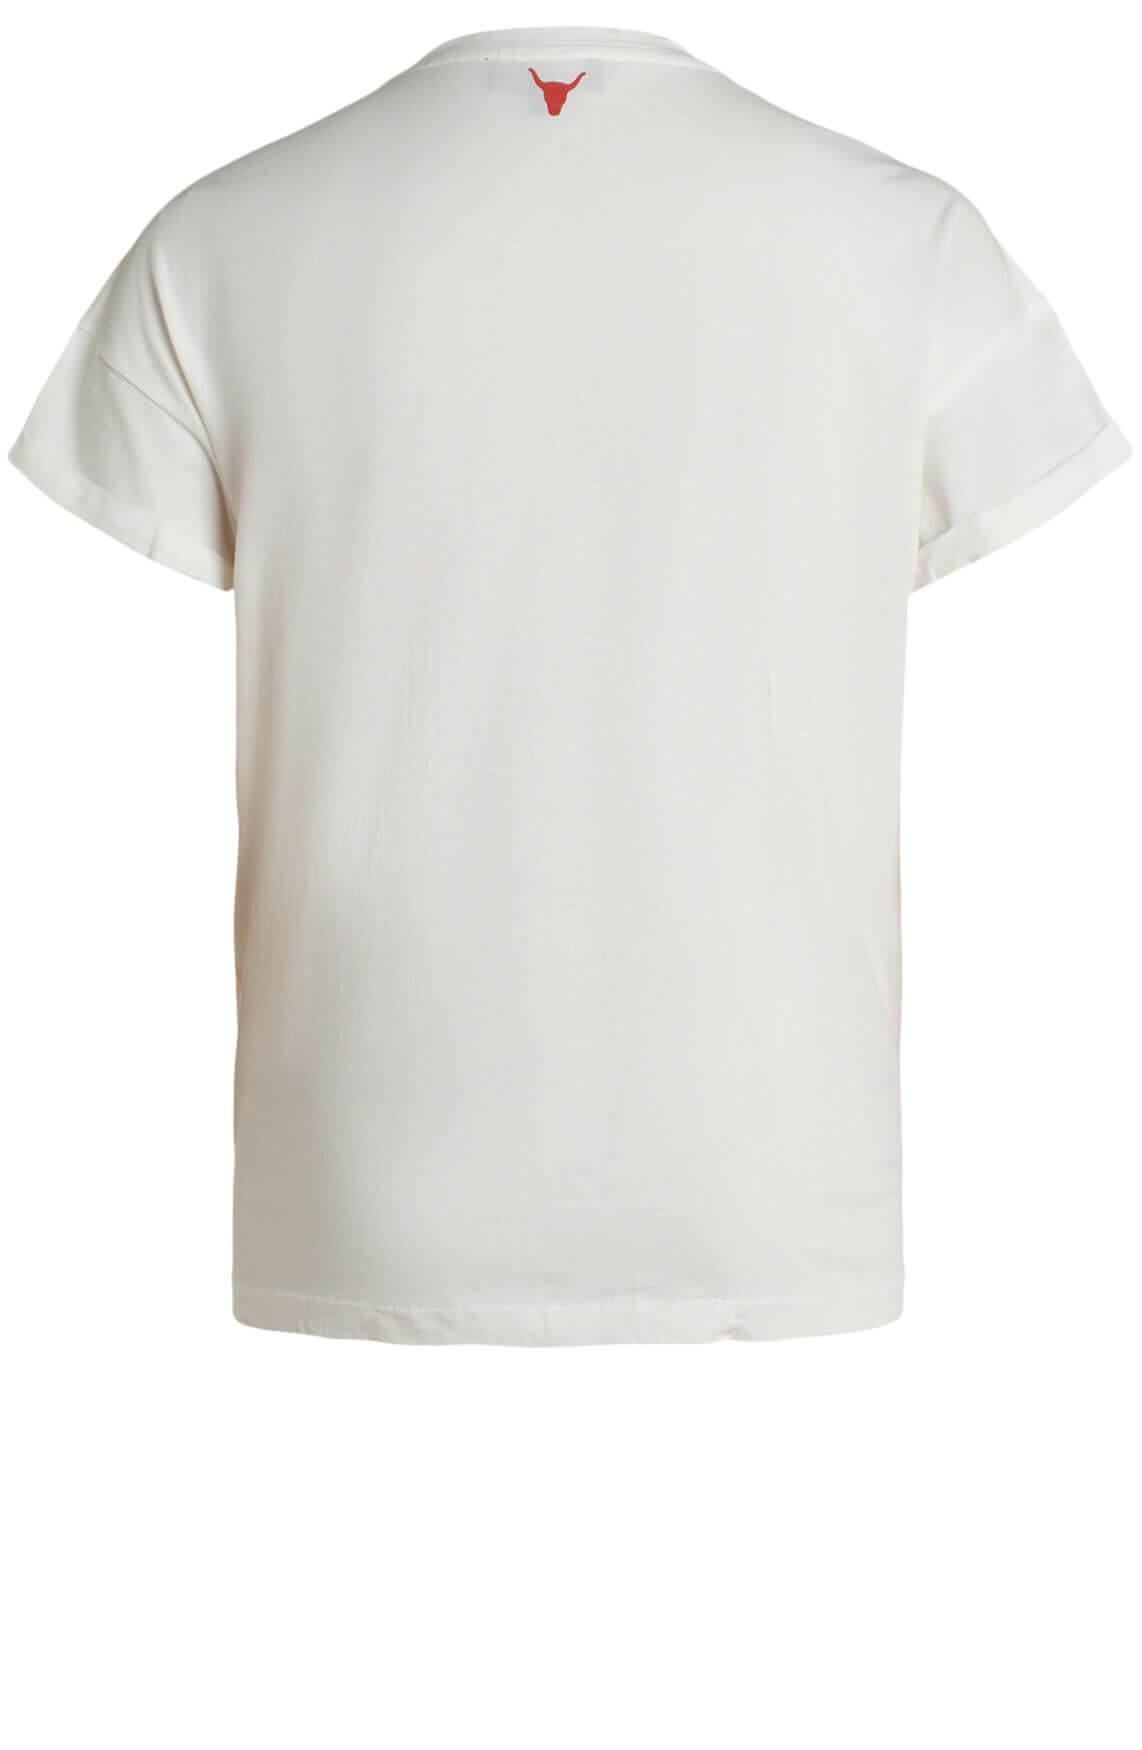 Alix The Label Dames Shirt met artwork wit